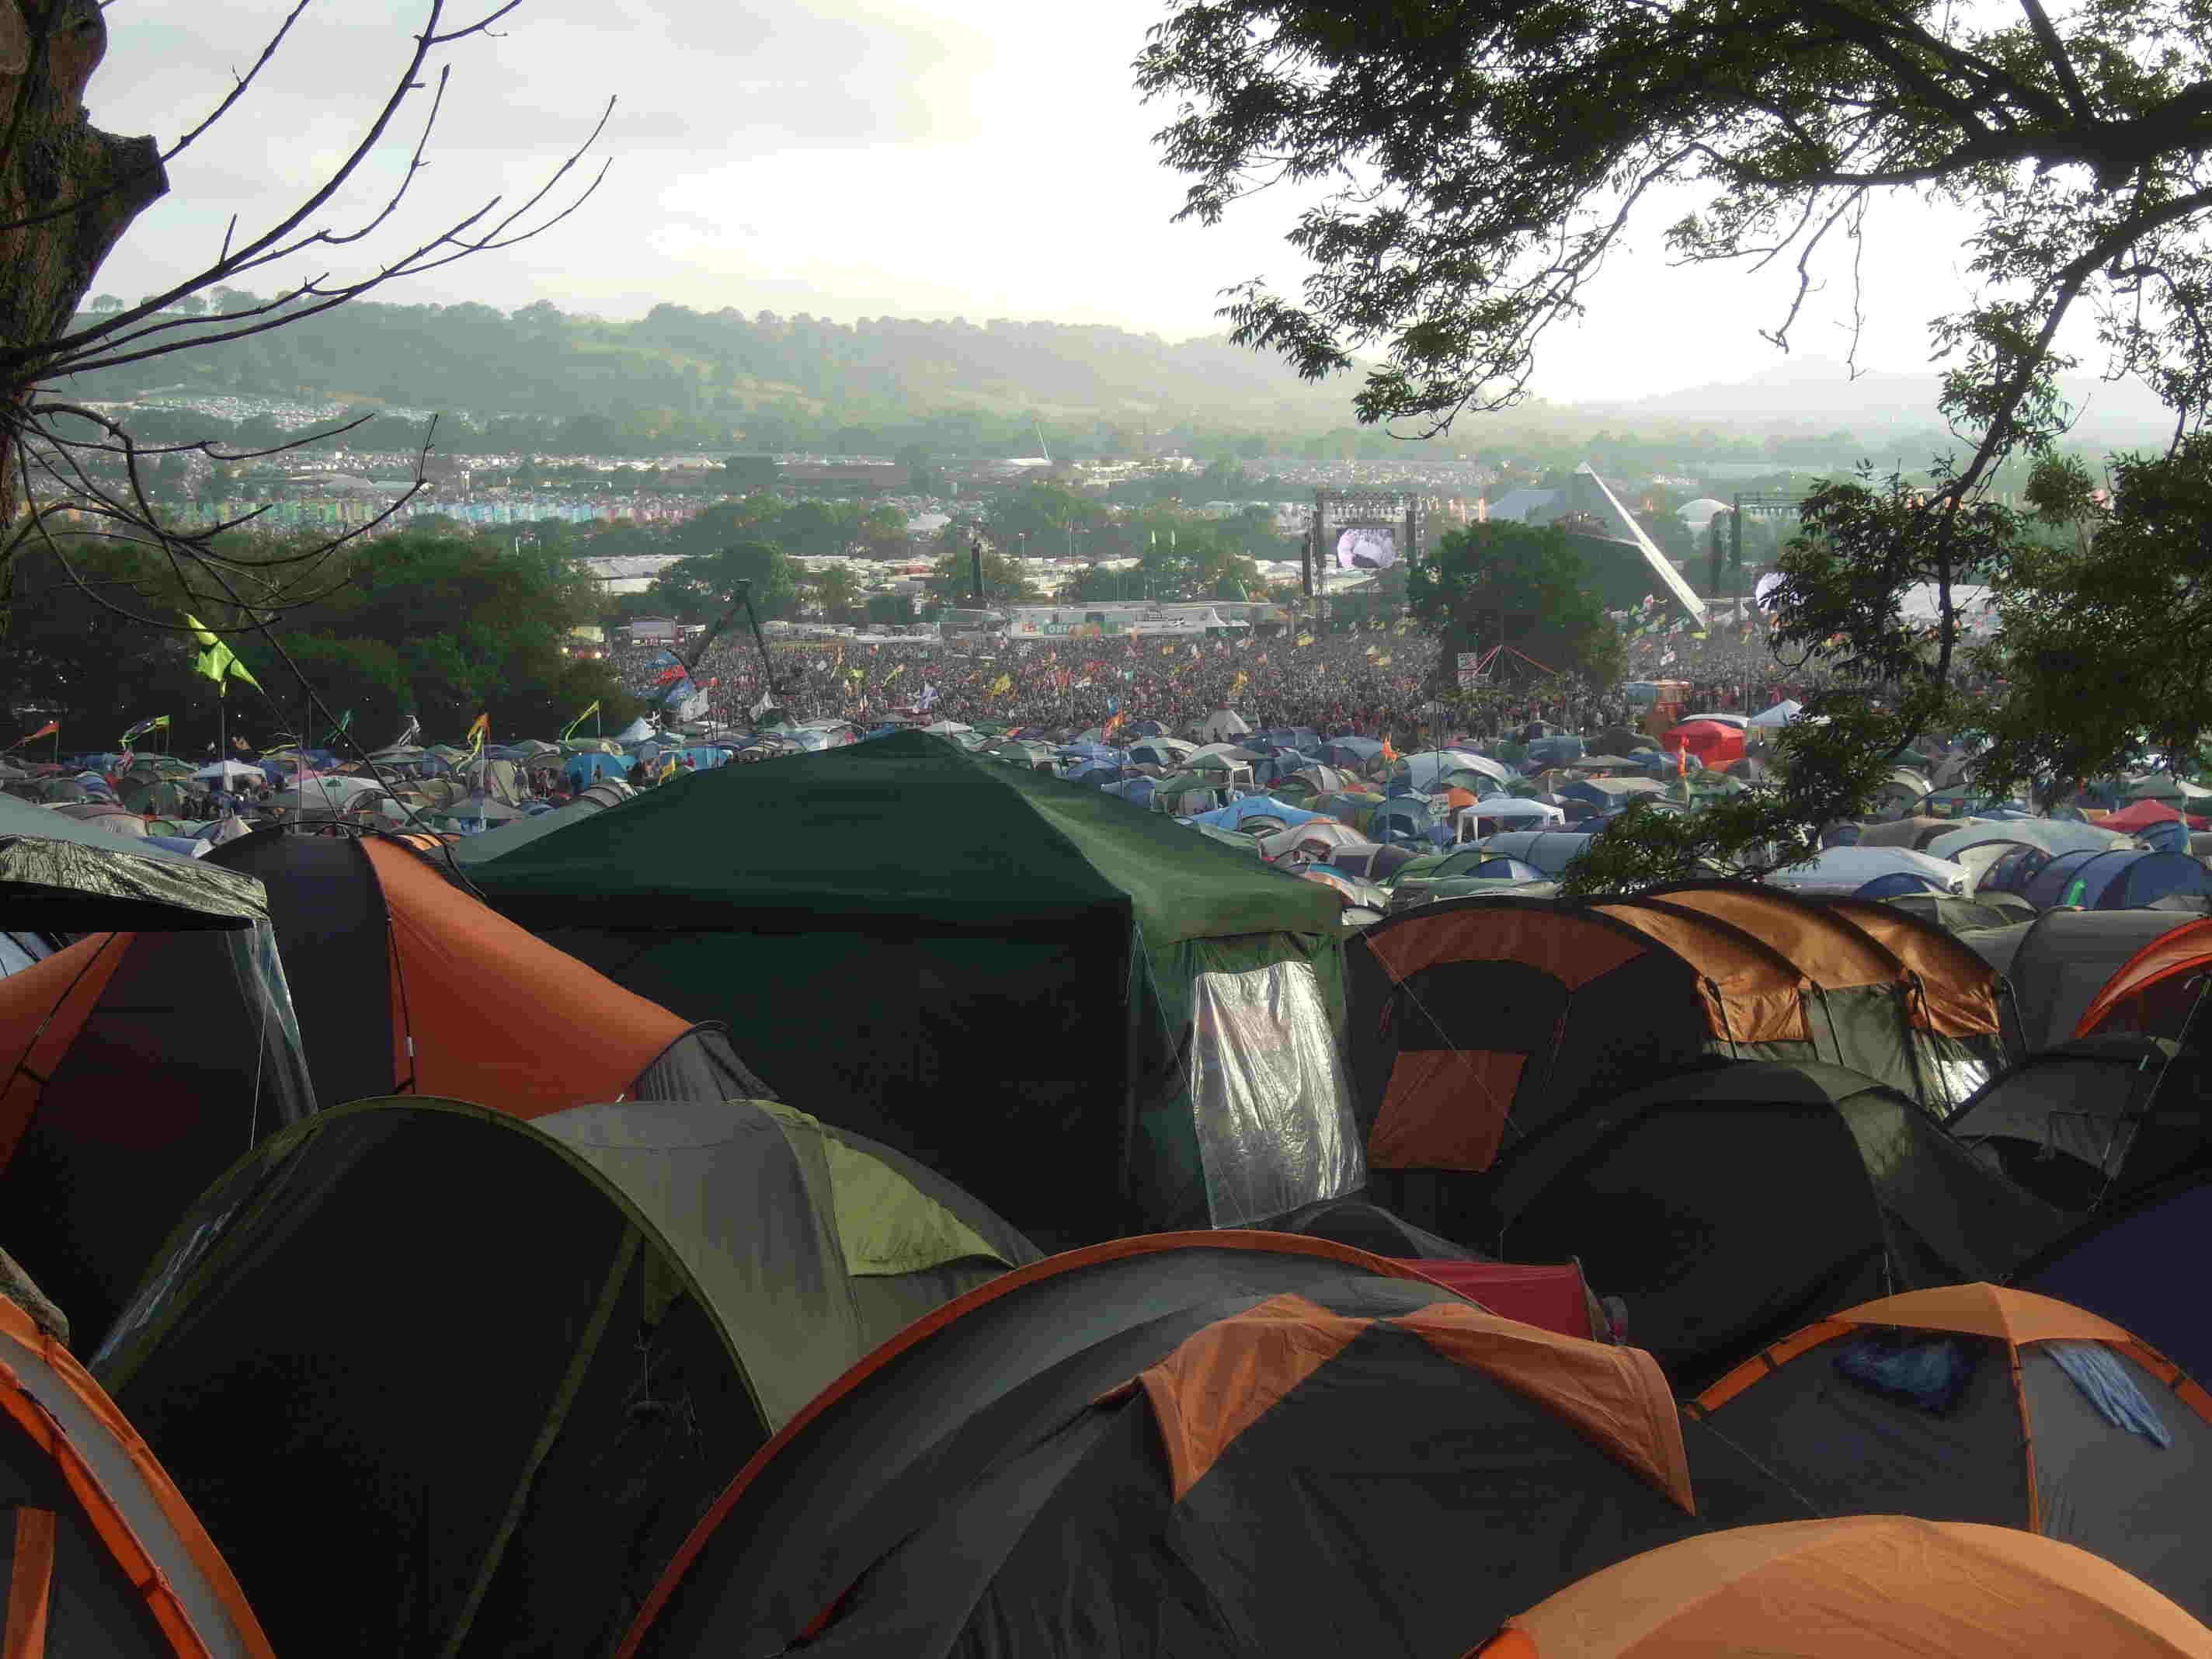 g2013-15_camping3w